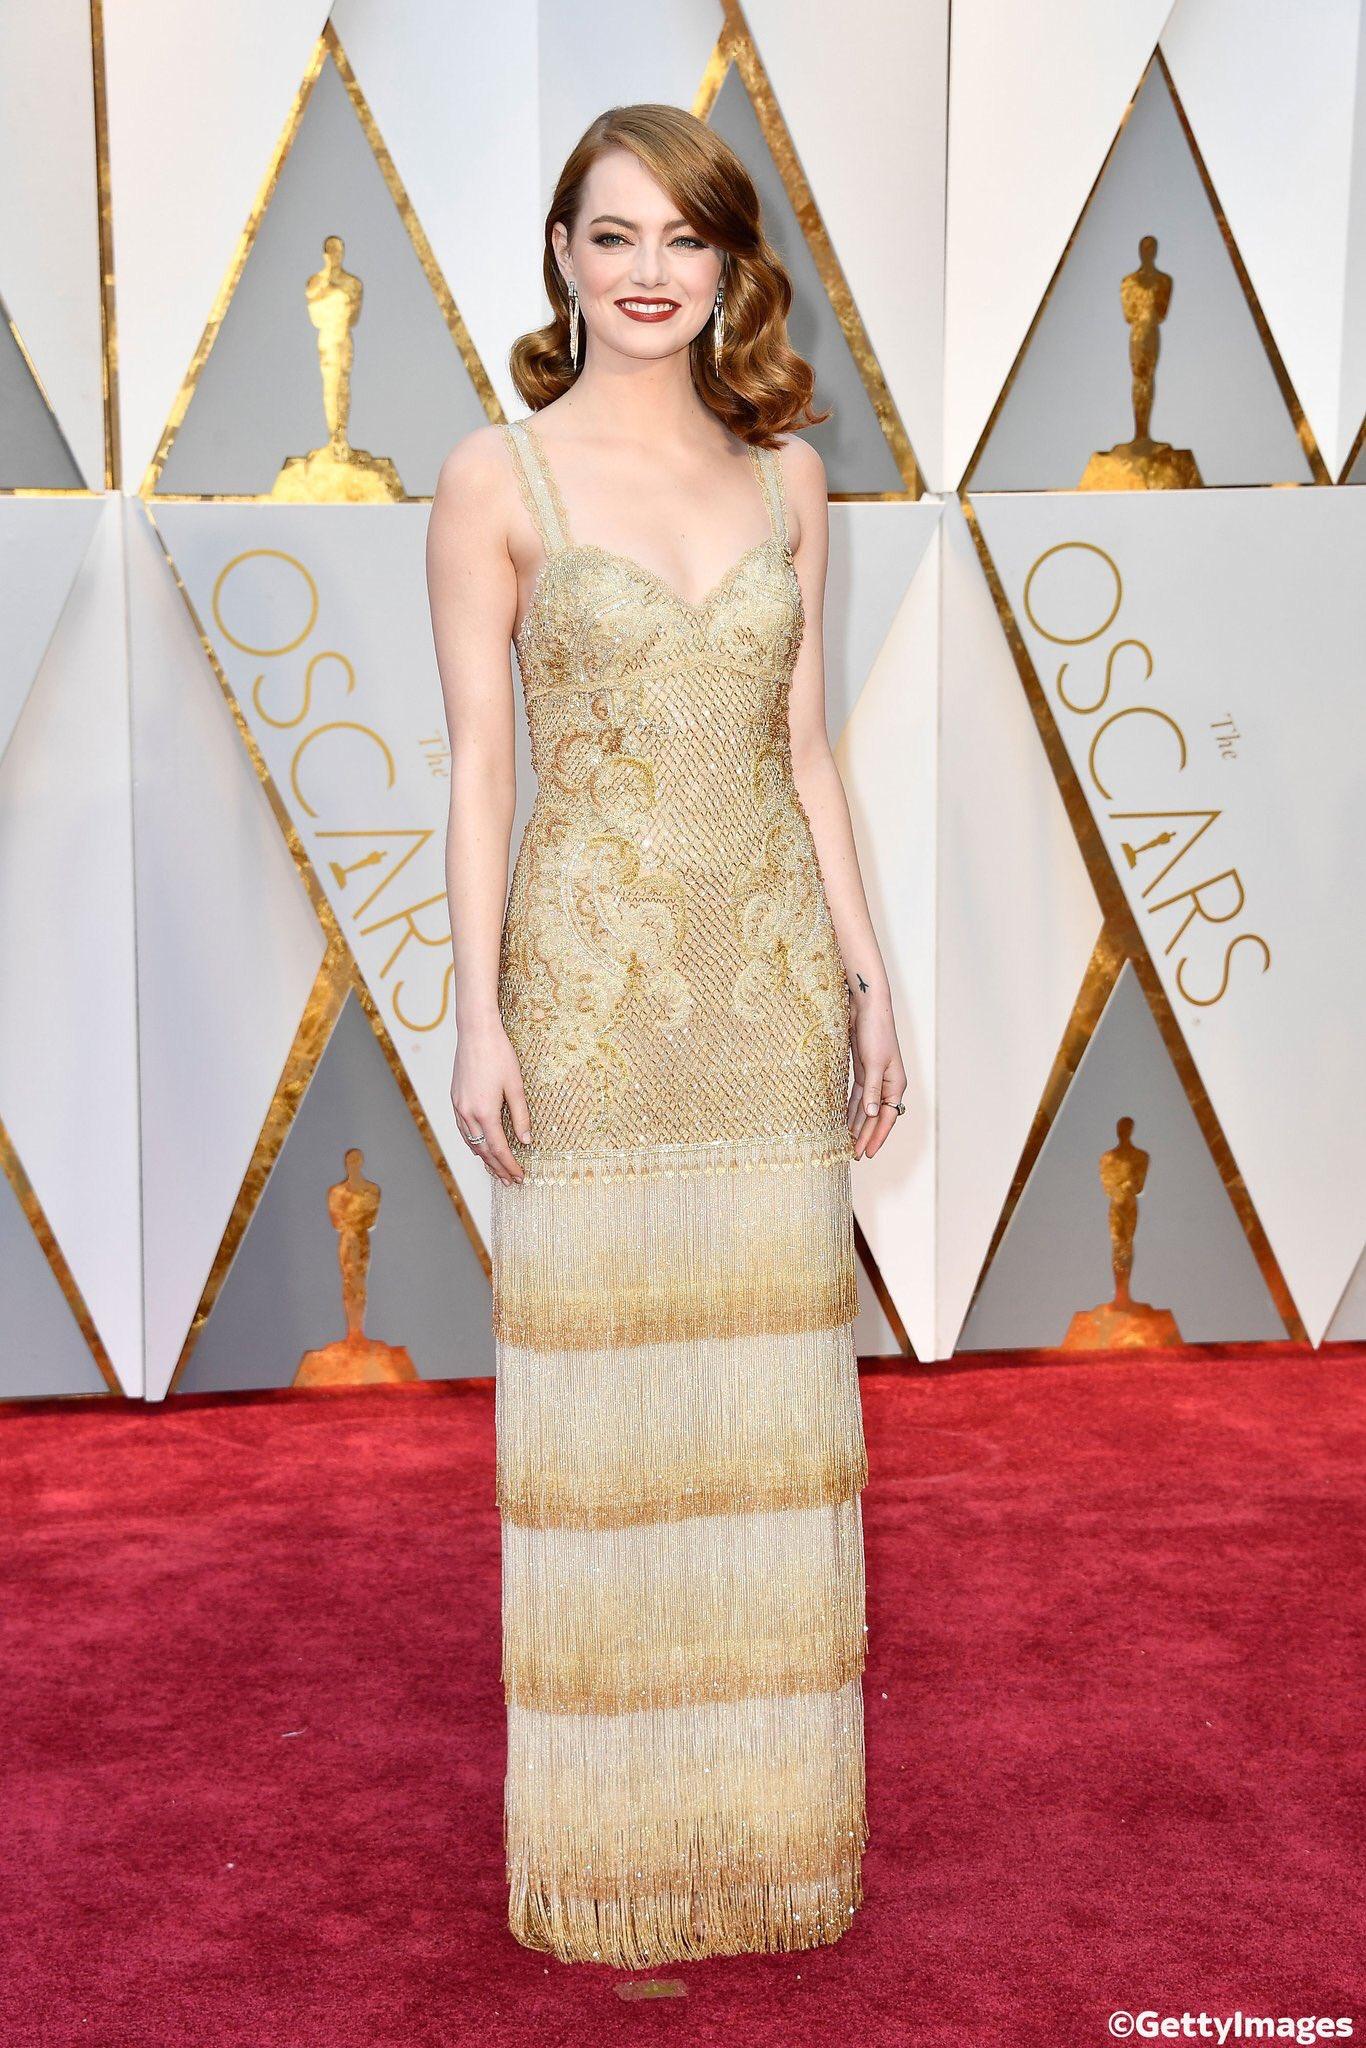 Oscar 2017: la bellissima Emma Stone sul red carpet